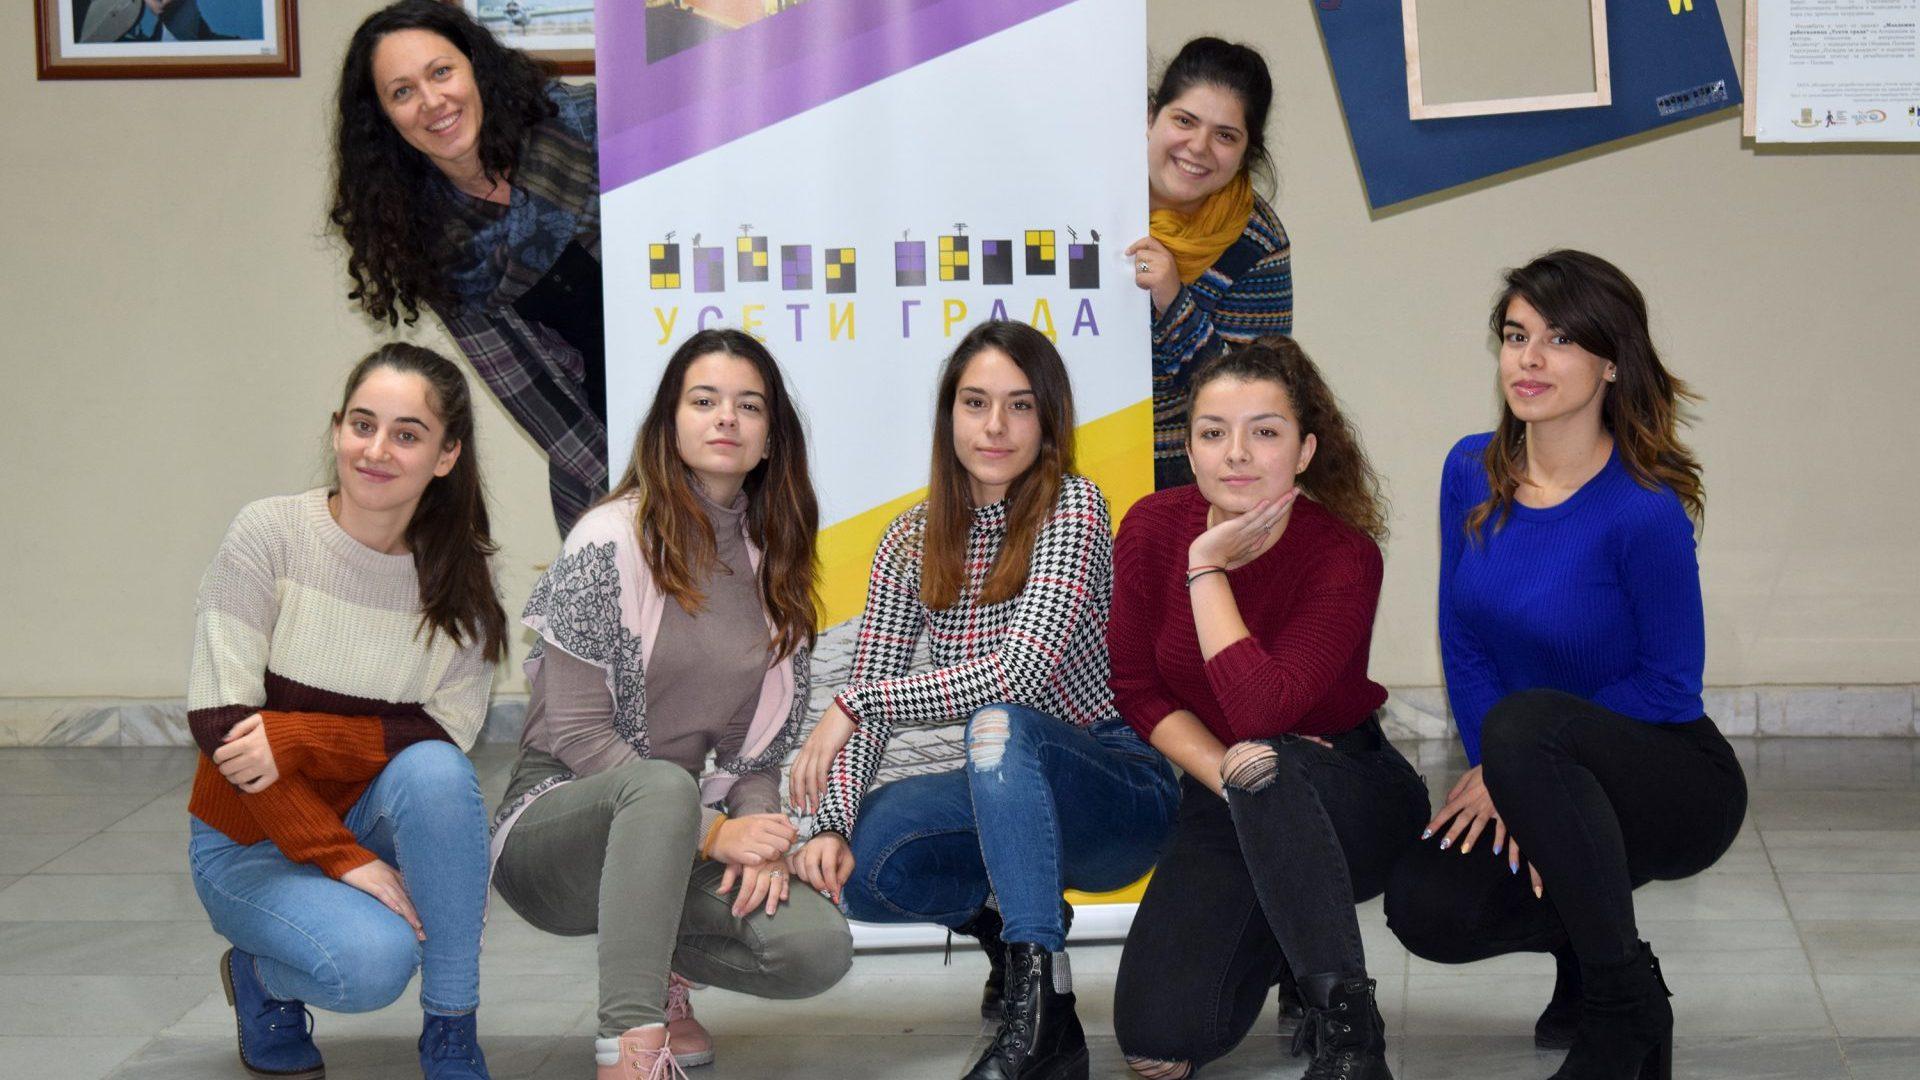 interaktivna-izlojba-bez-ramki-plovdivski-universitet